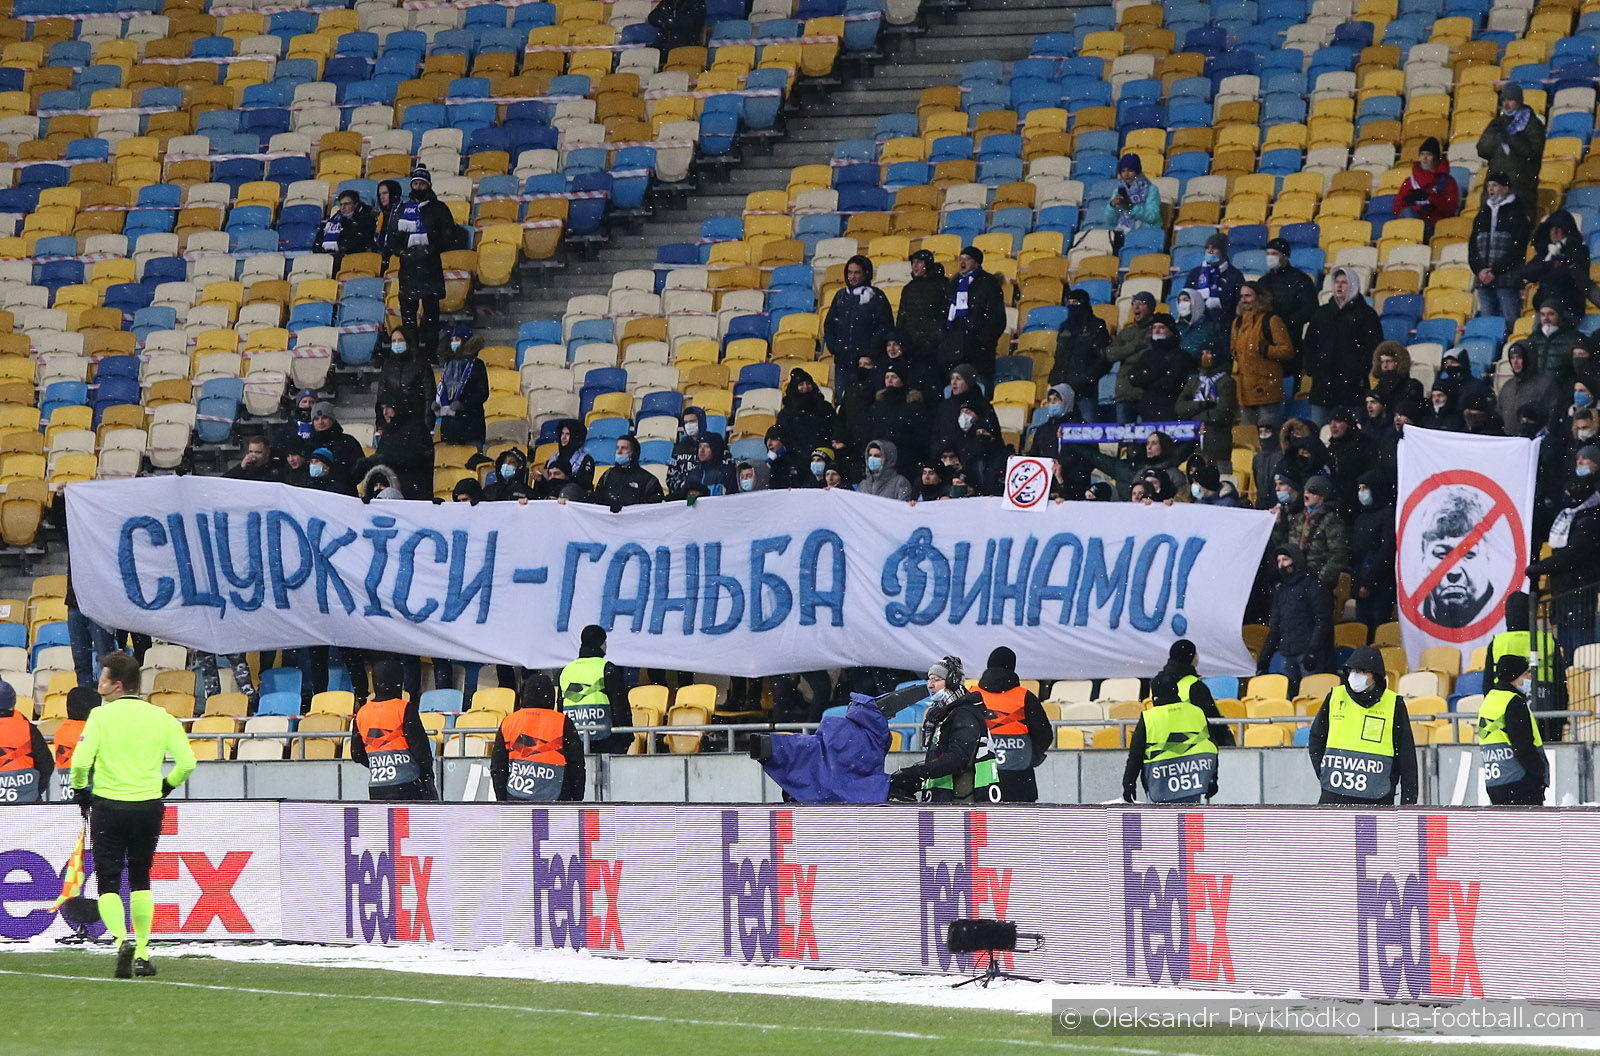 Ничья на фоне протеста. ФОТО репортаж с матча Динамо - Брюгге - фото 13